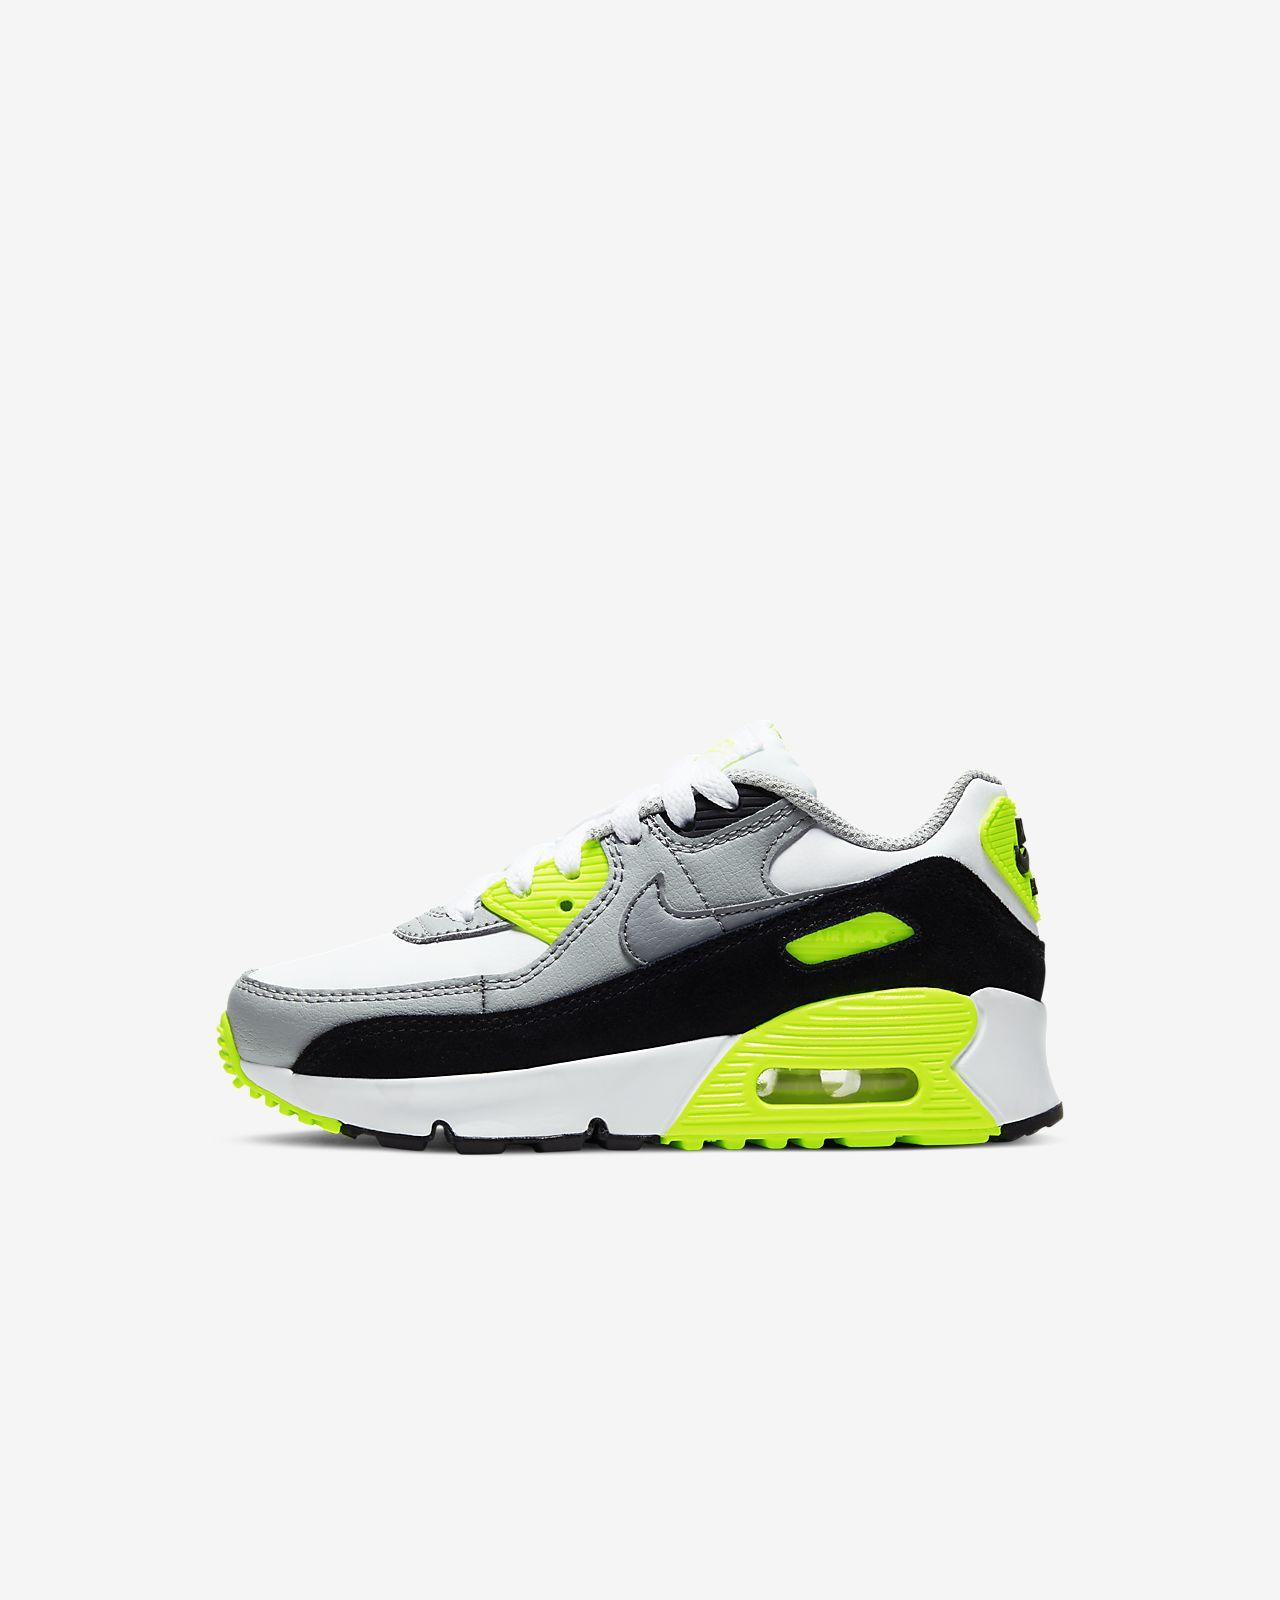 Børn Tilbud Sko. Nike DK